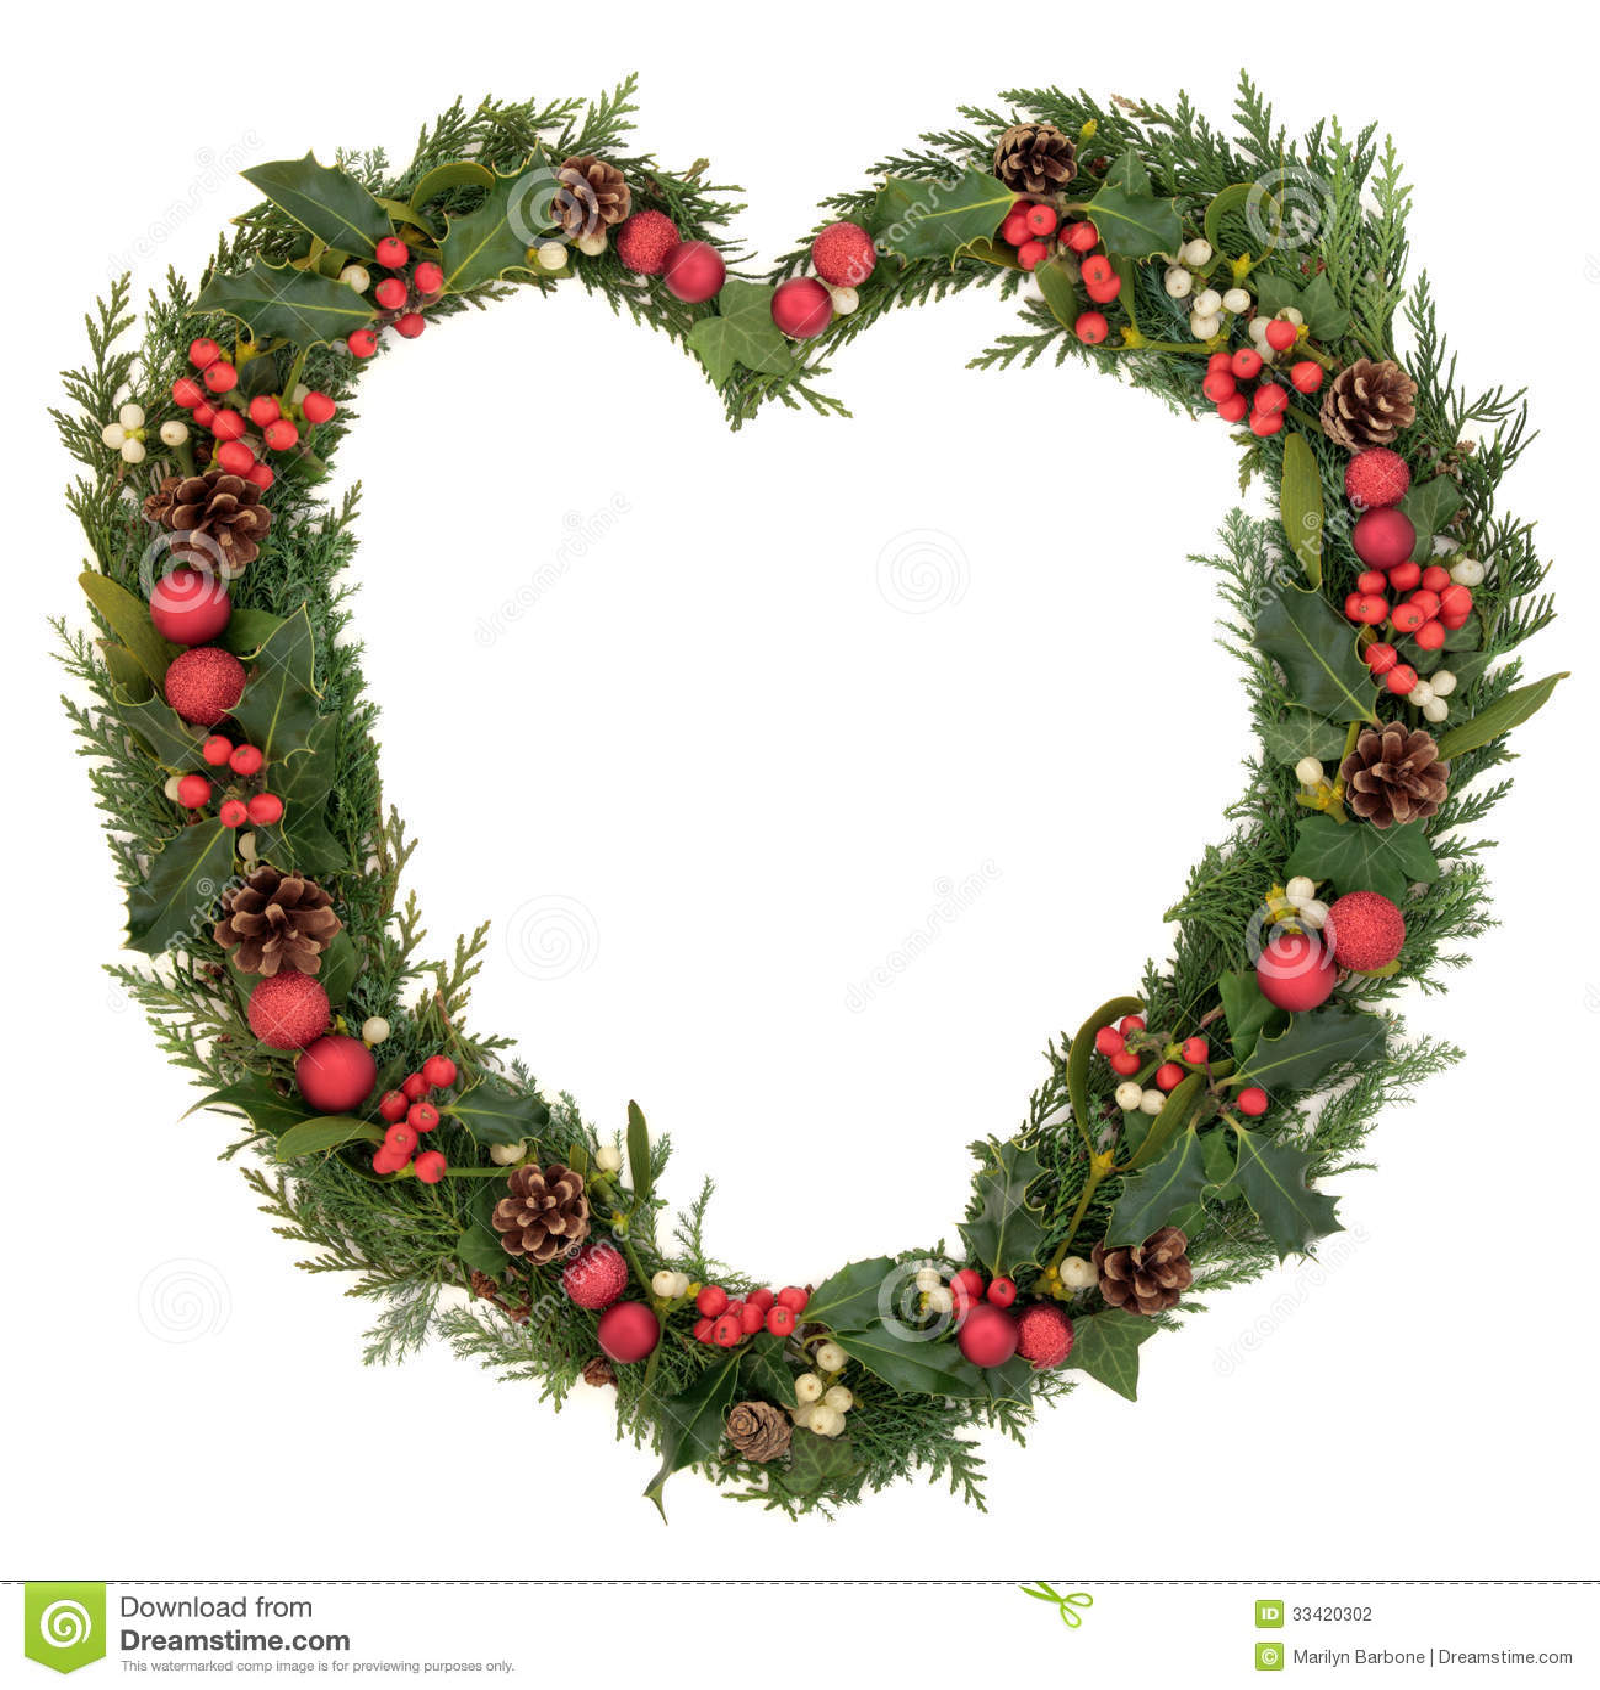 Heart Shaped Christmas Wreath Stock Photo Image 33420302